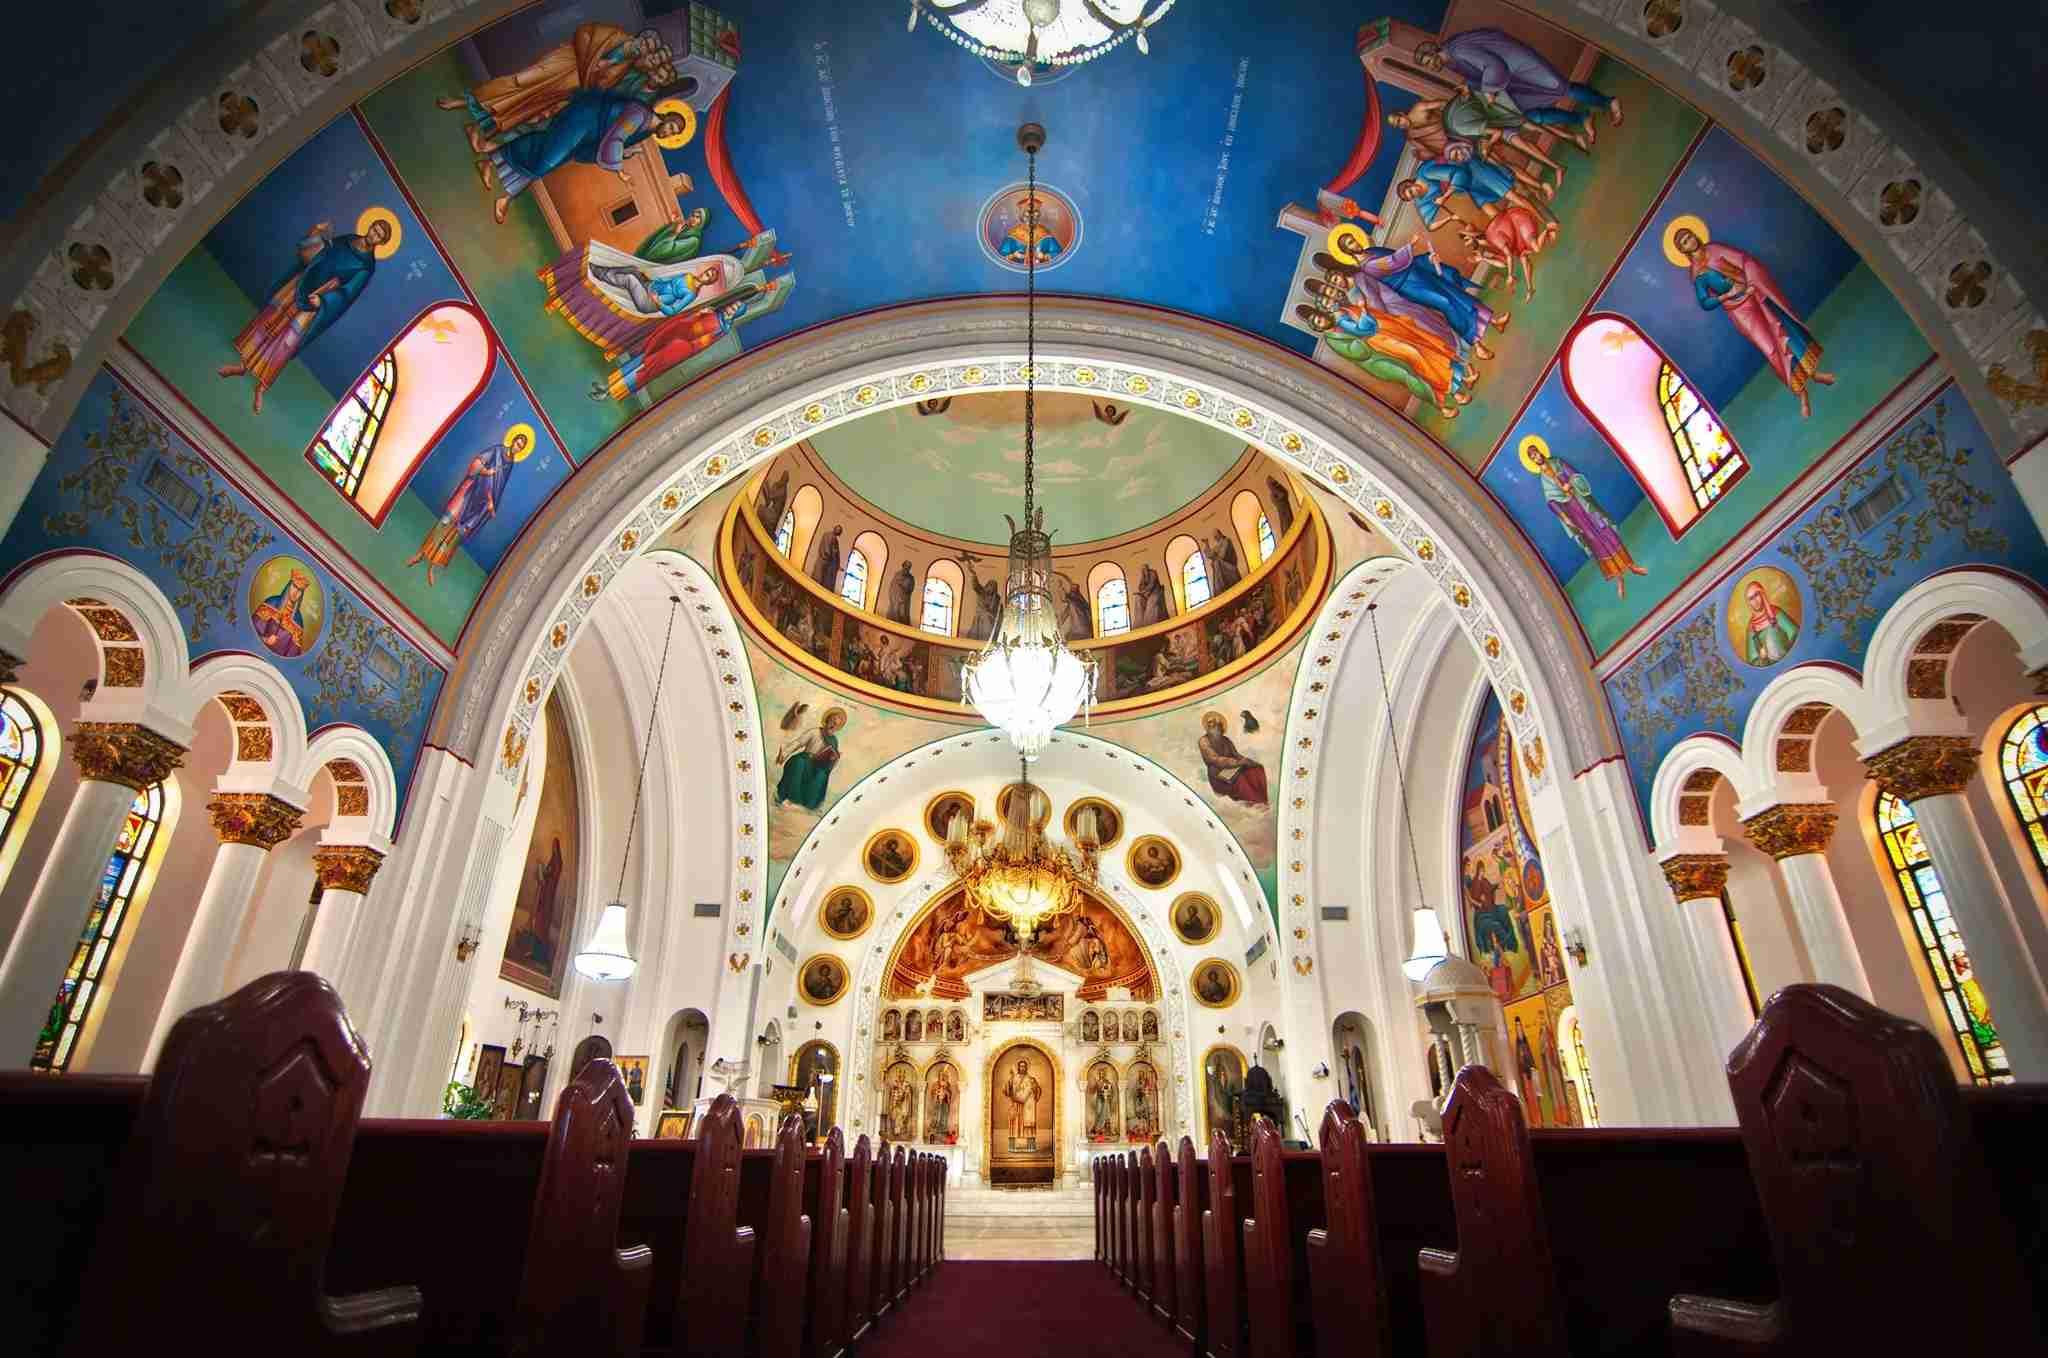 Saint Nicholas Greek Orthodox Cathedral in Tarpon Springs, Florida (Image courtesy of the church